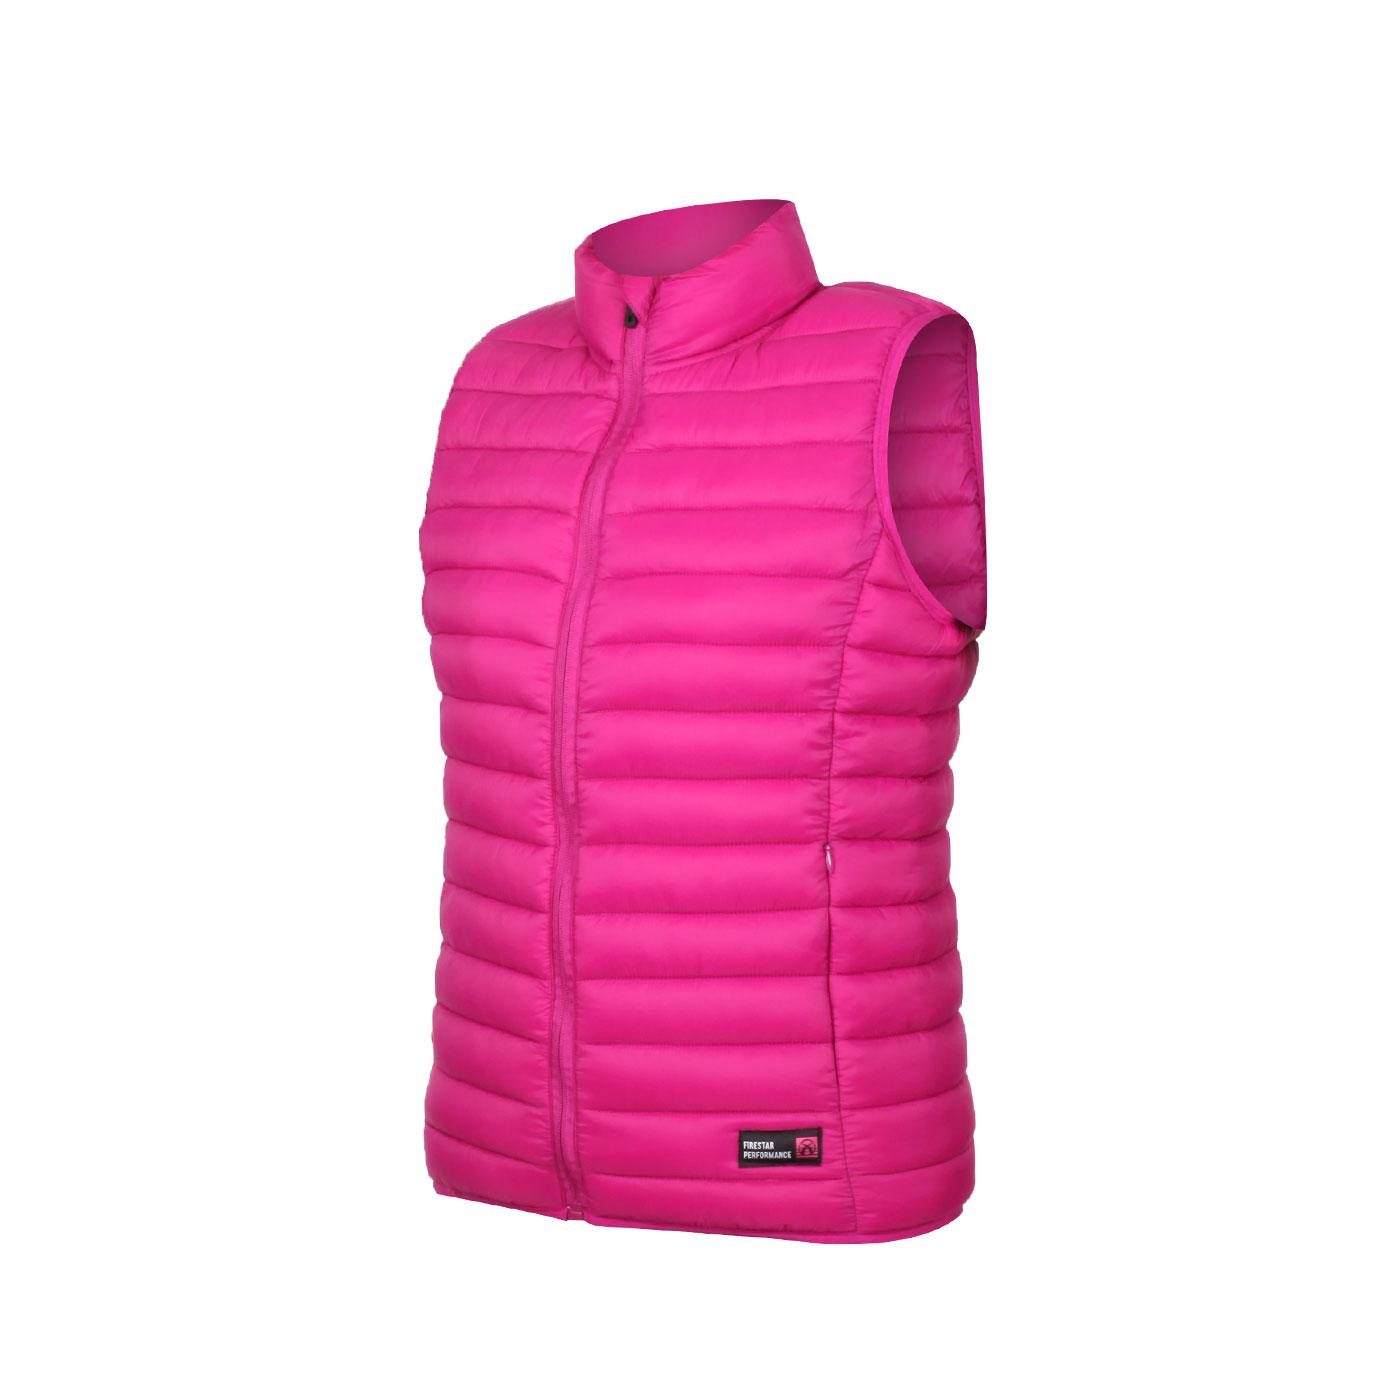 FIRESTAR 女款立領鋪棉背心 HL039-47 - 紫桃紅